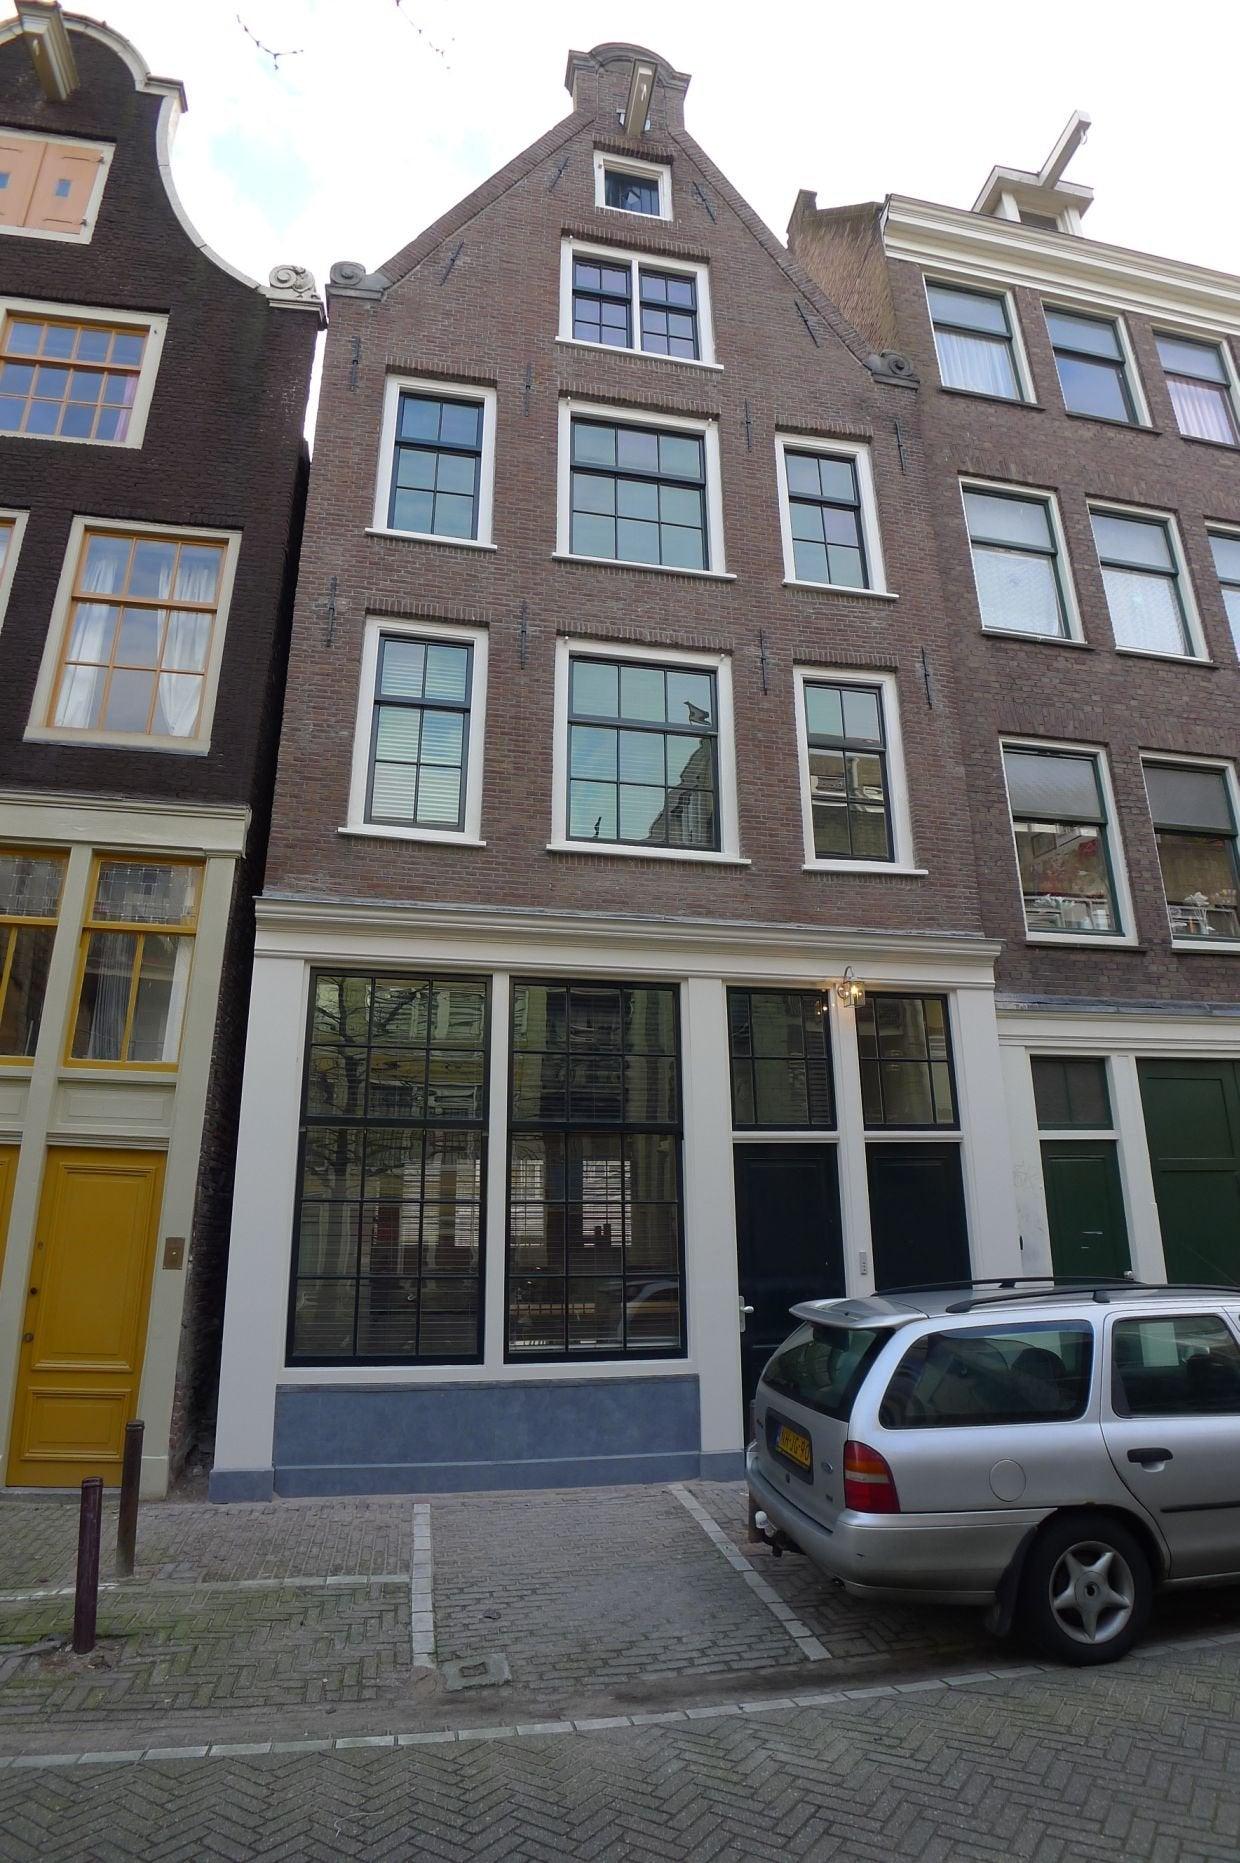 Photo of Rozenstraat, Amsterdam